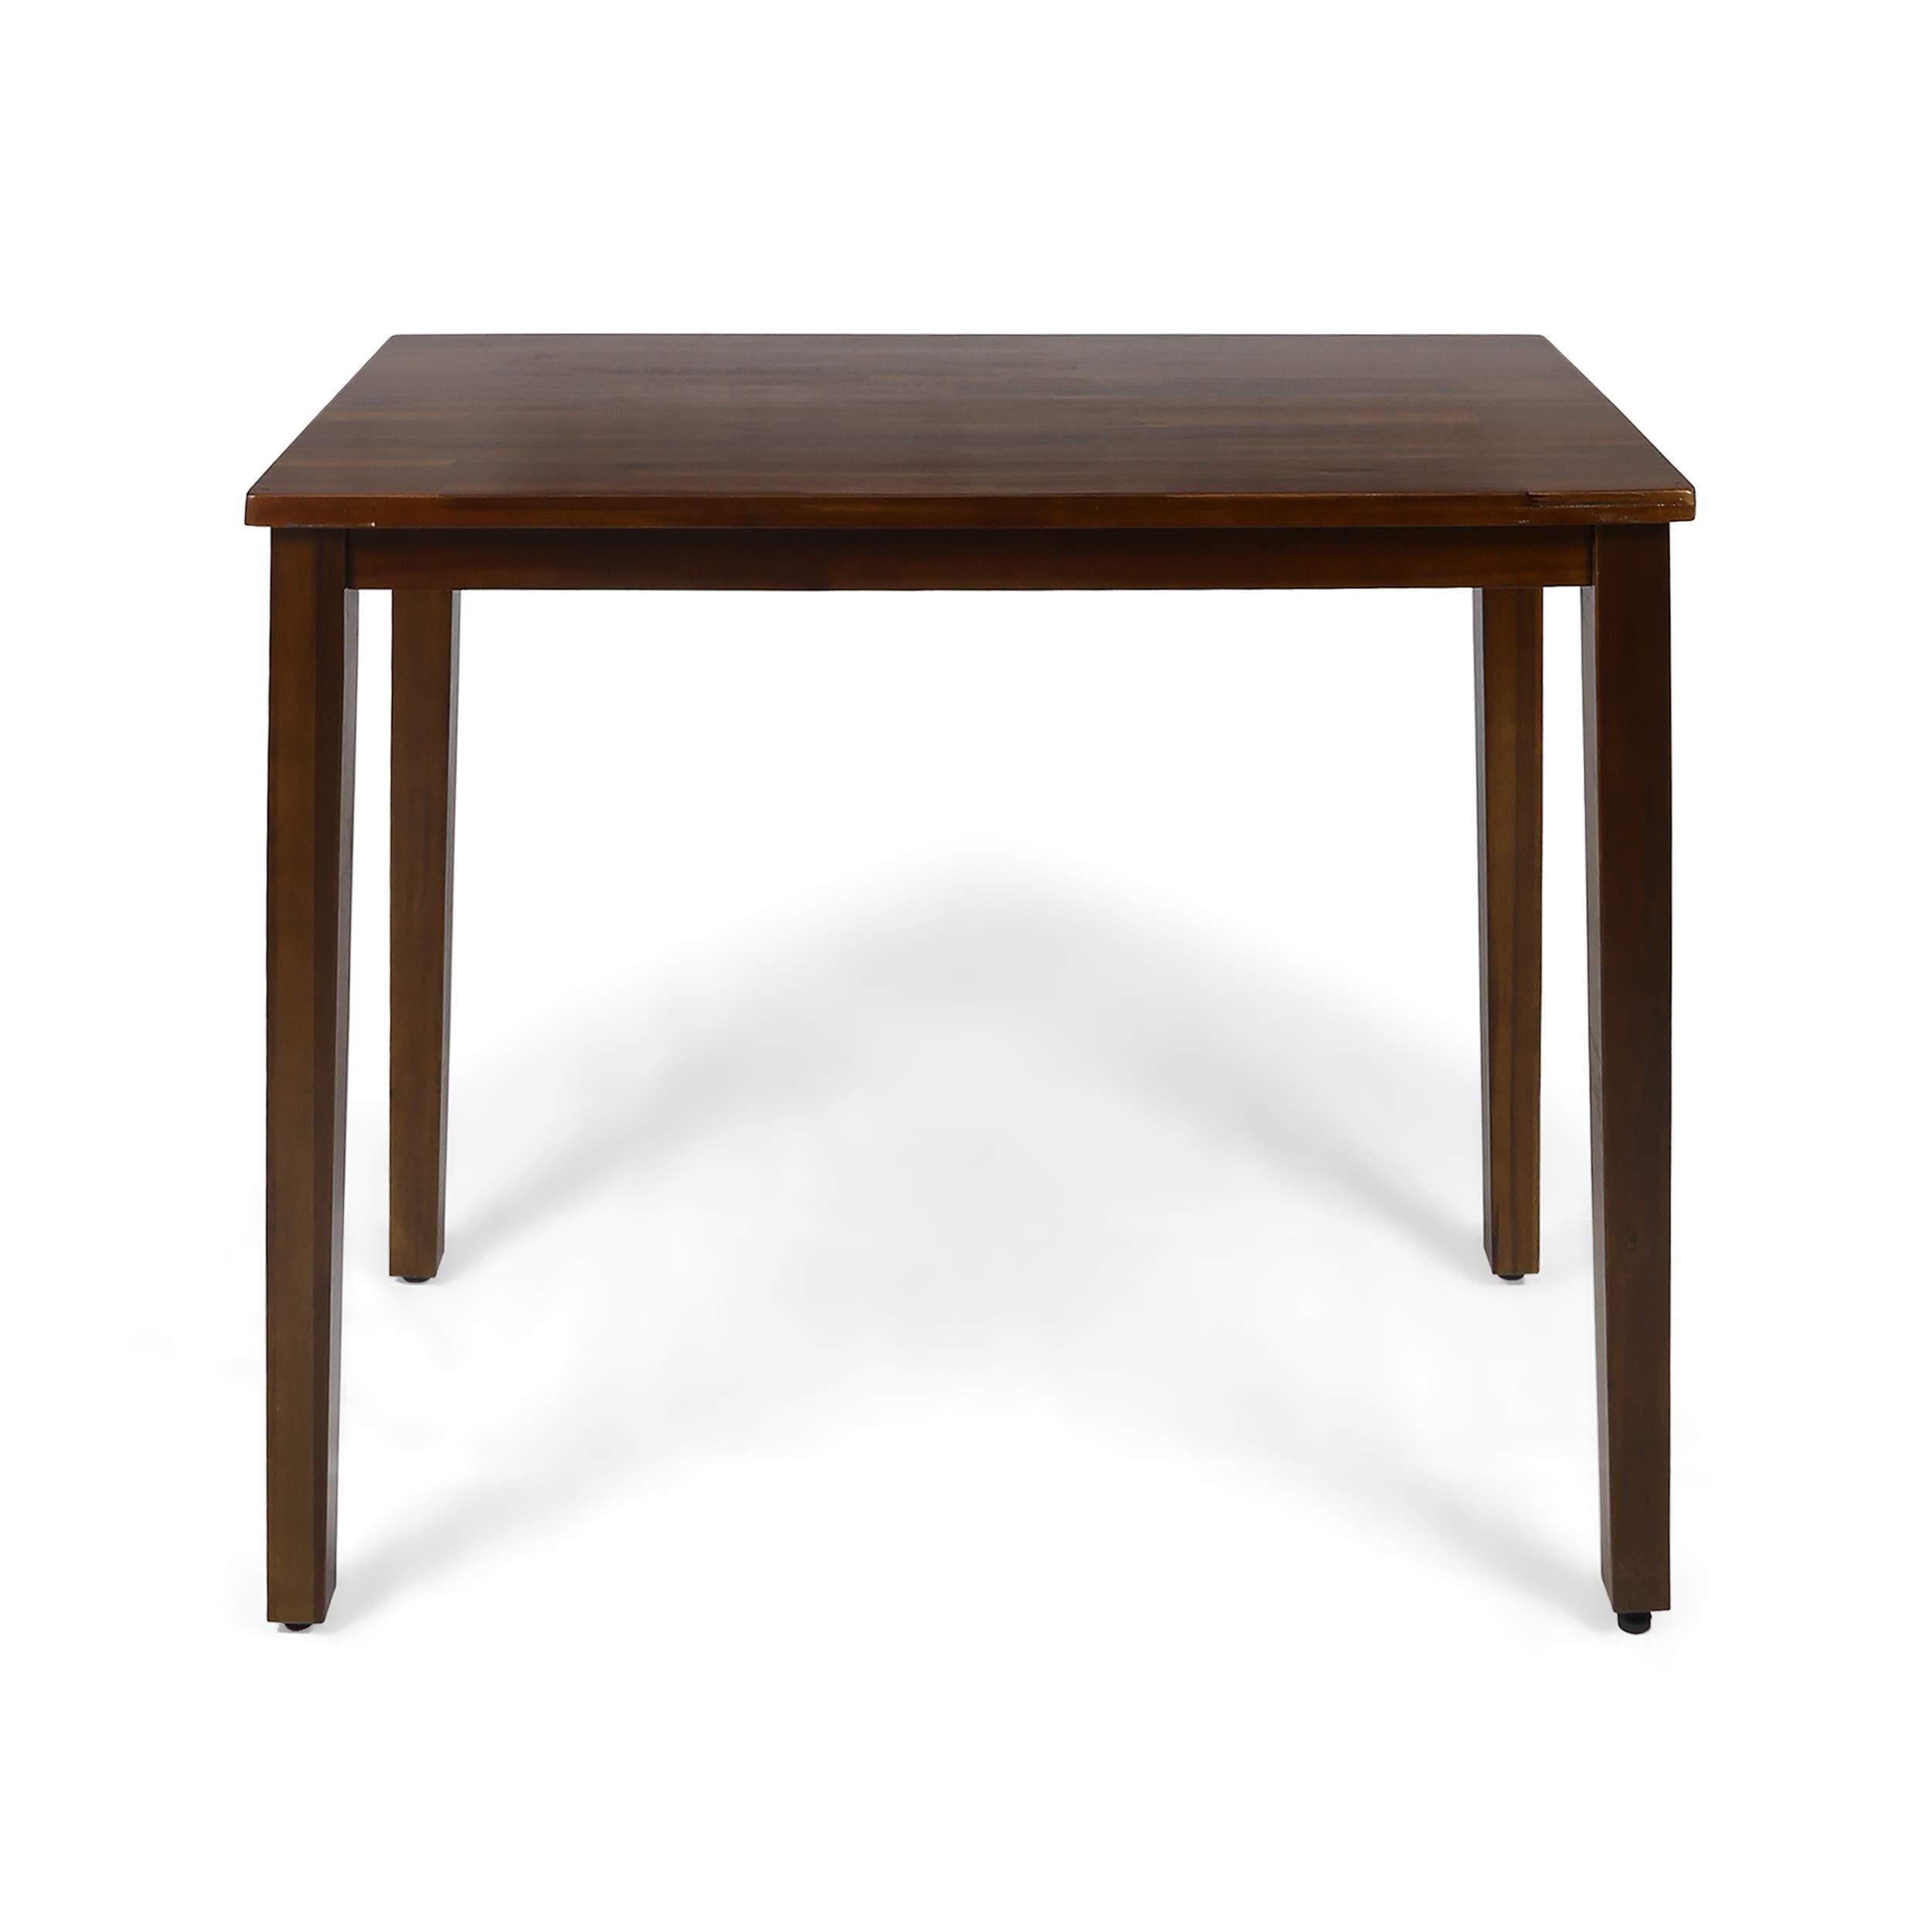 Christopher Knight Home Taylo Contemporary Acacia Wood Bar Height Table, Rich Mahogany Finish by Christopher Knight Home